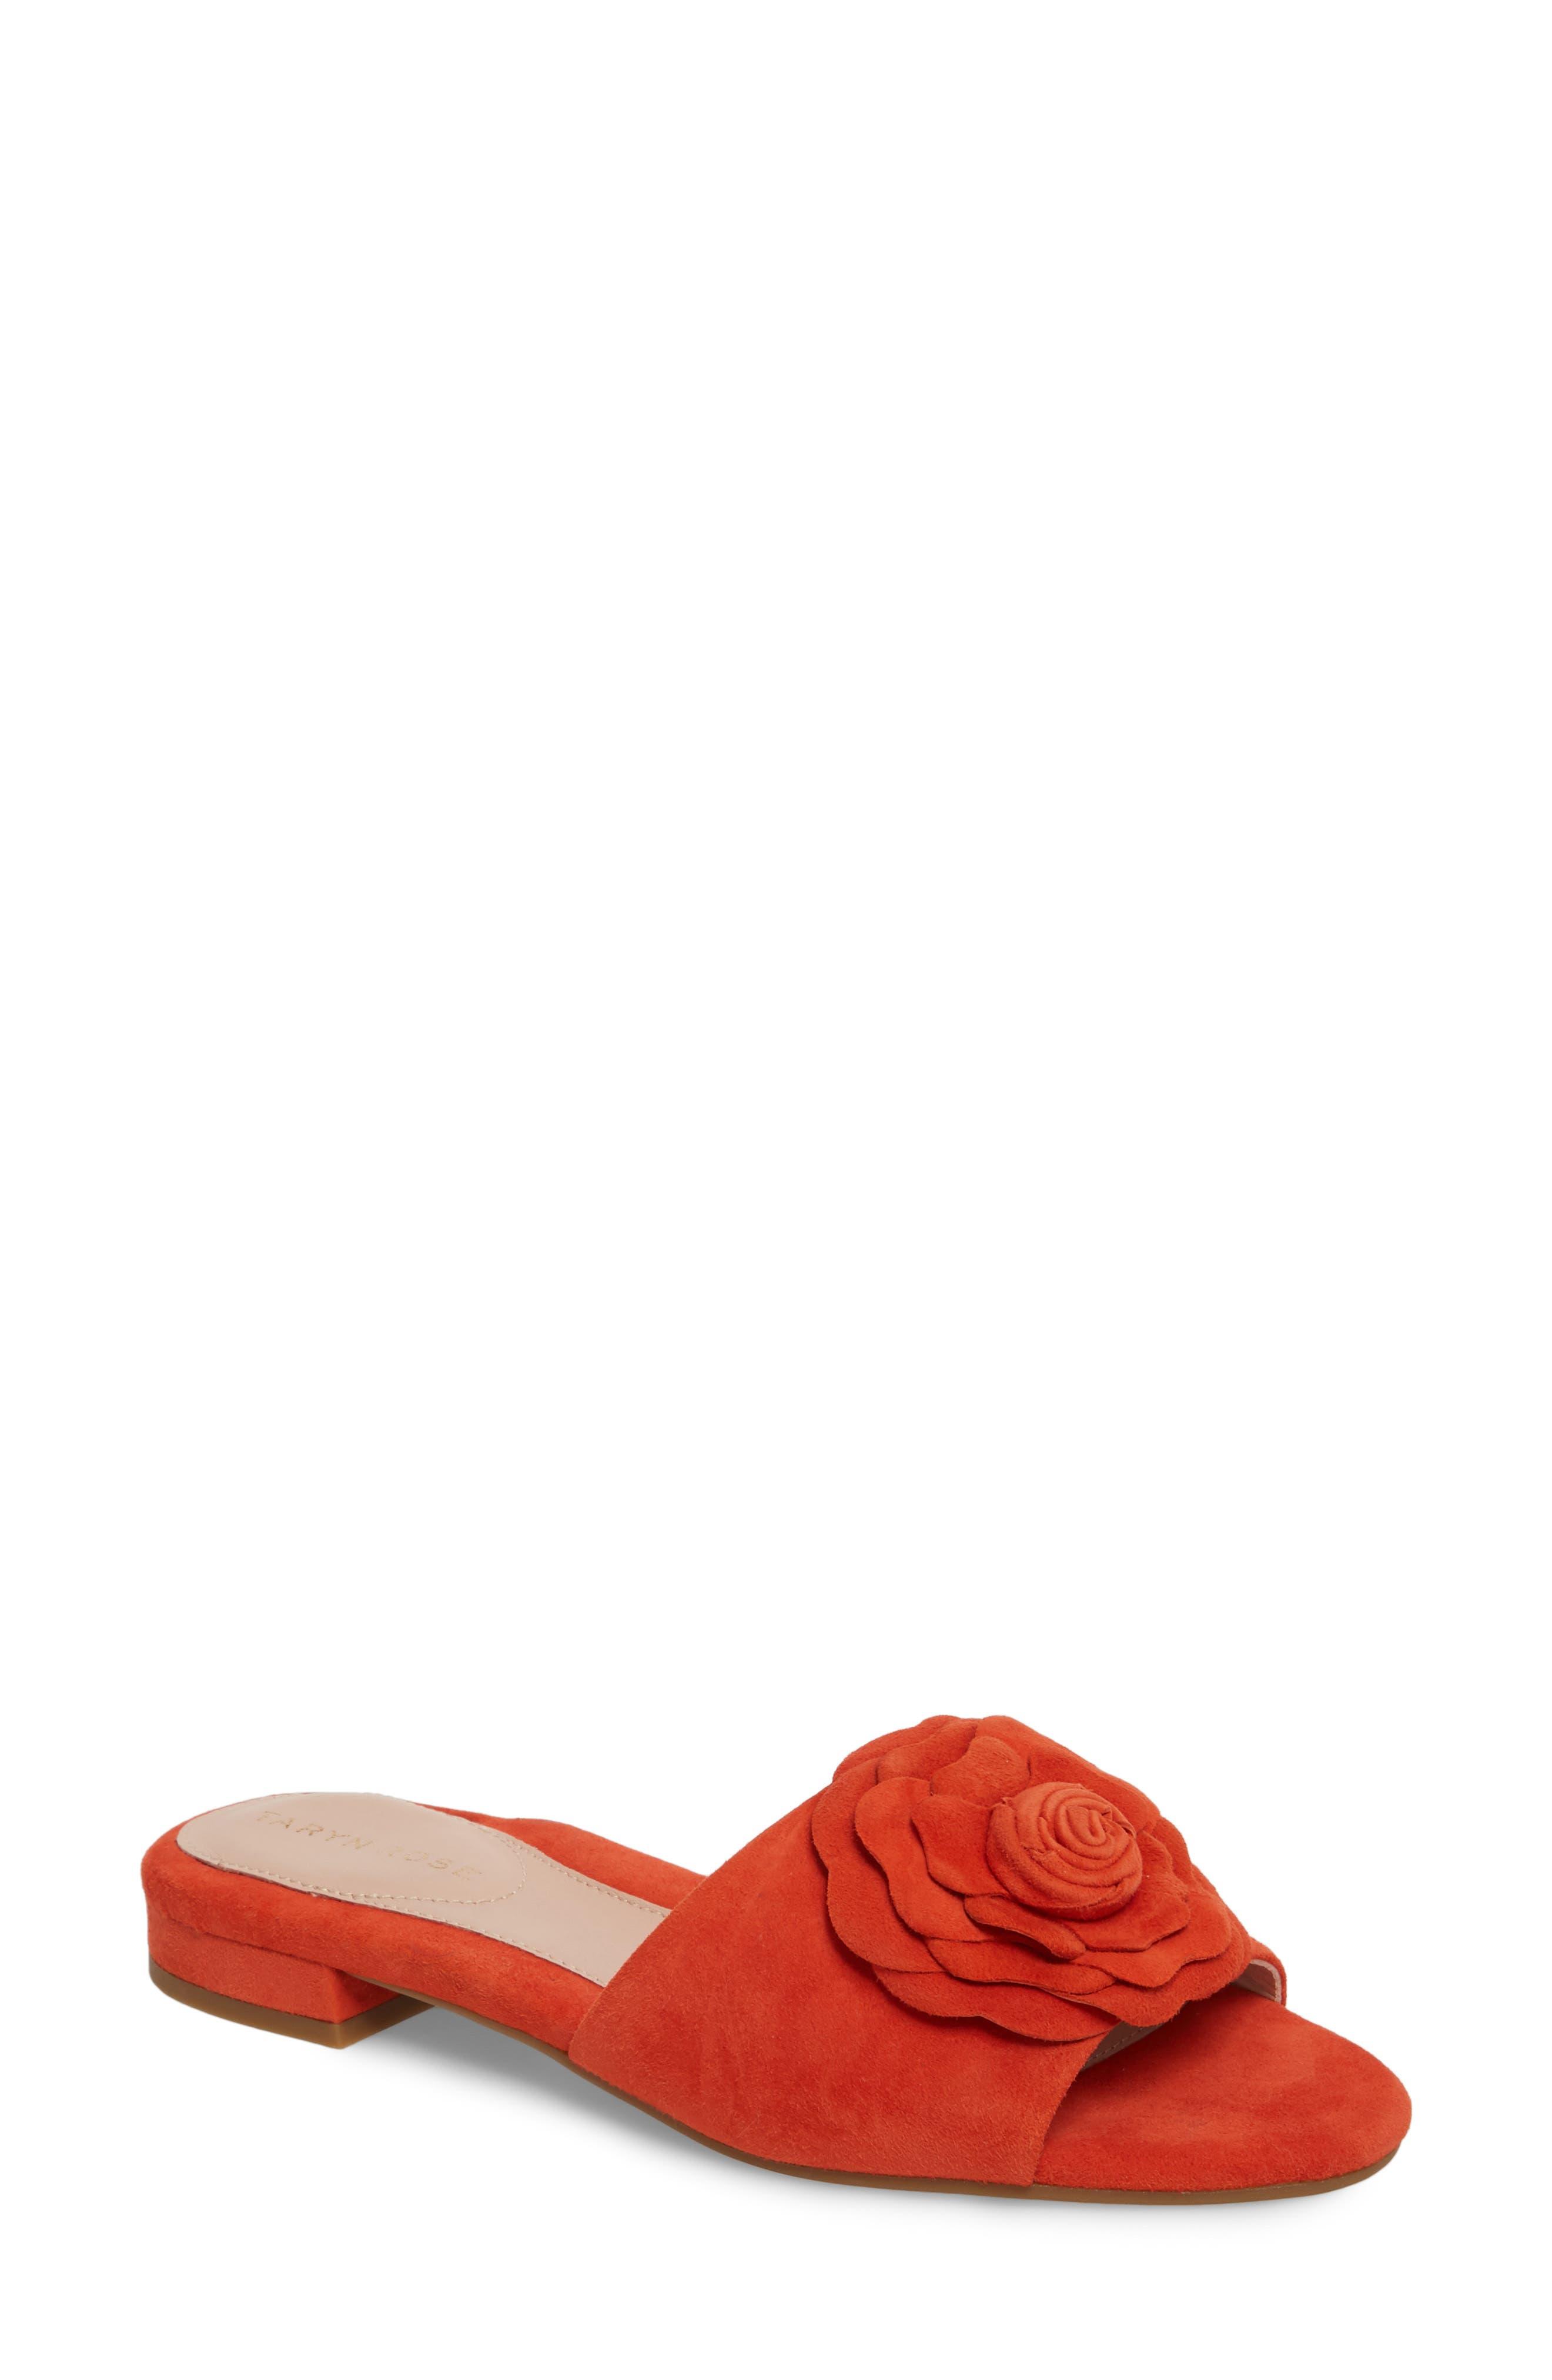 Taryn Rose Violet Flower Slide Sandal- Red